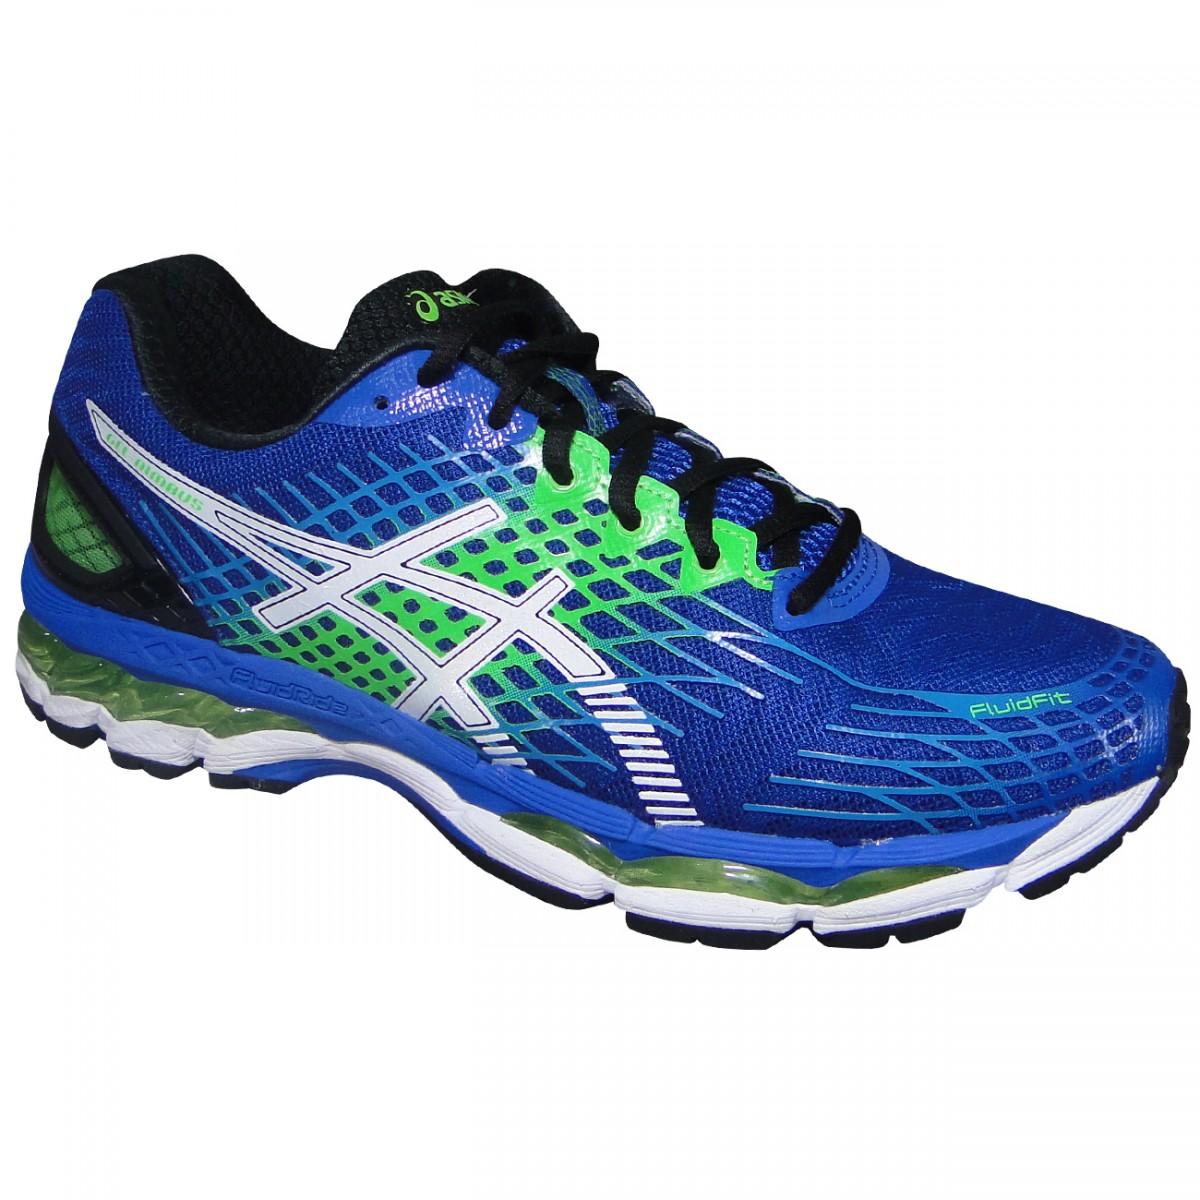 1a502ed0353b9 Tenis Asics Gel-Nimbus 17 T507N 5901 - Azul Branco Verde - Chuteira Nike